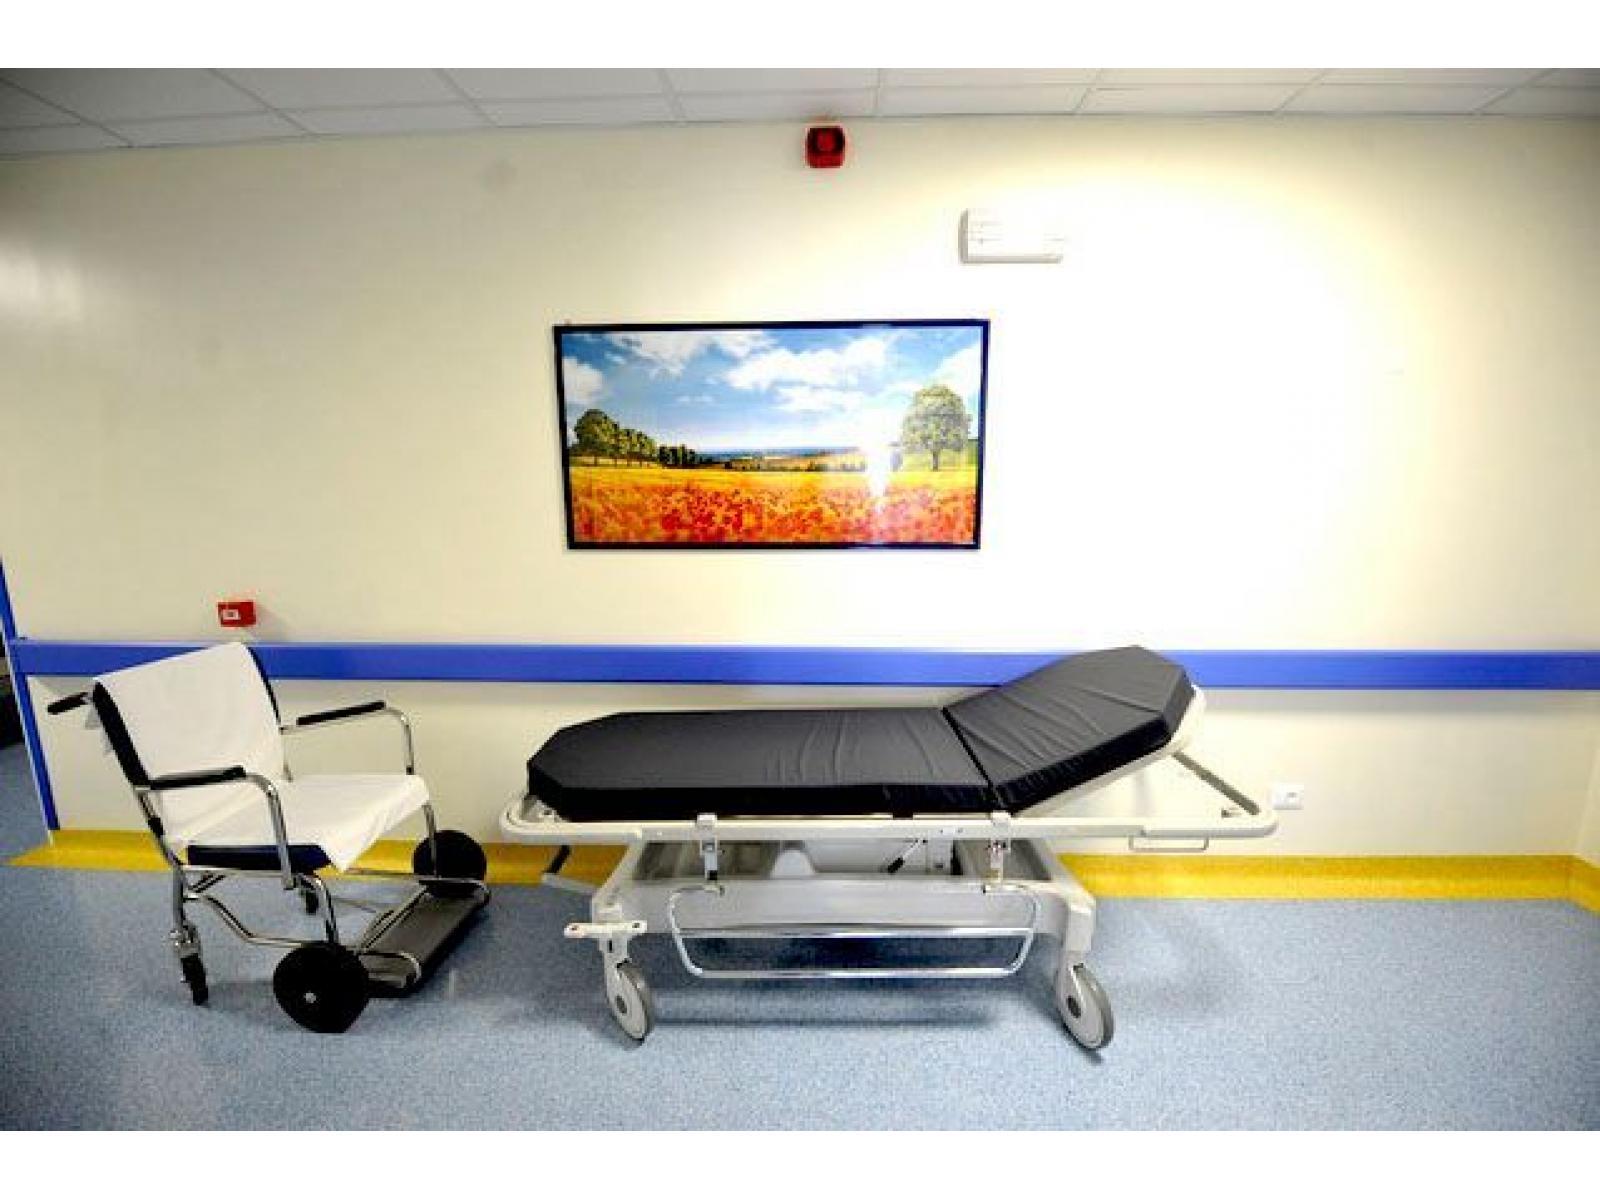 Spitalul Monza - 64190_425260184215918_2130983159_n.jpg